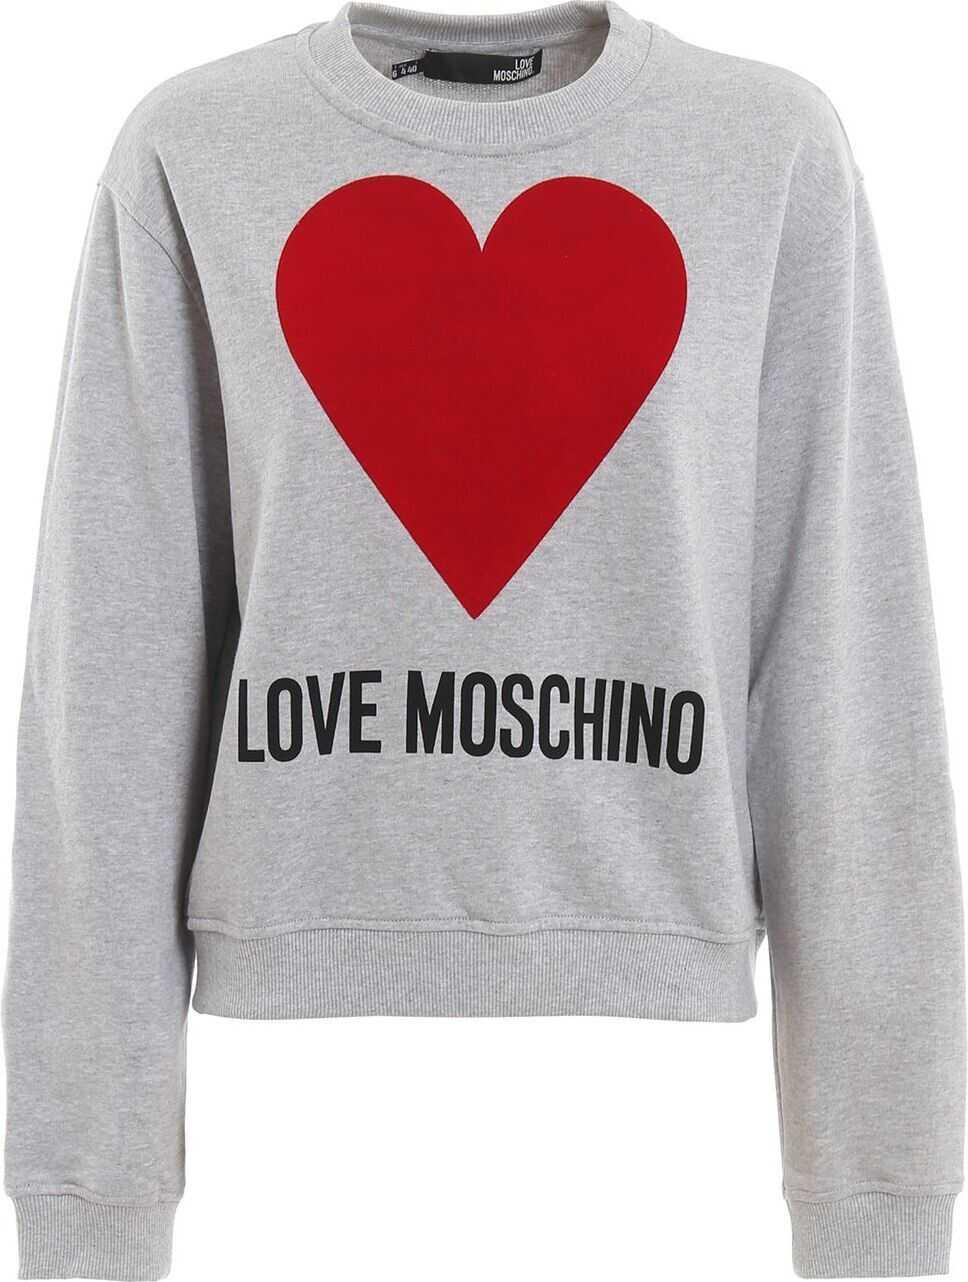 LOVE Moschino Cotton Sweatshirt GREY